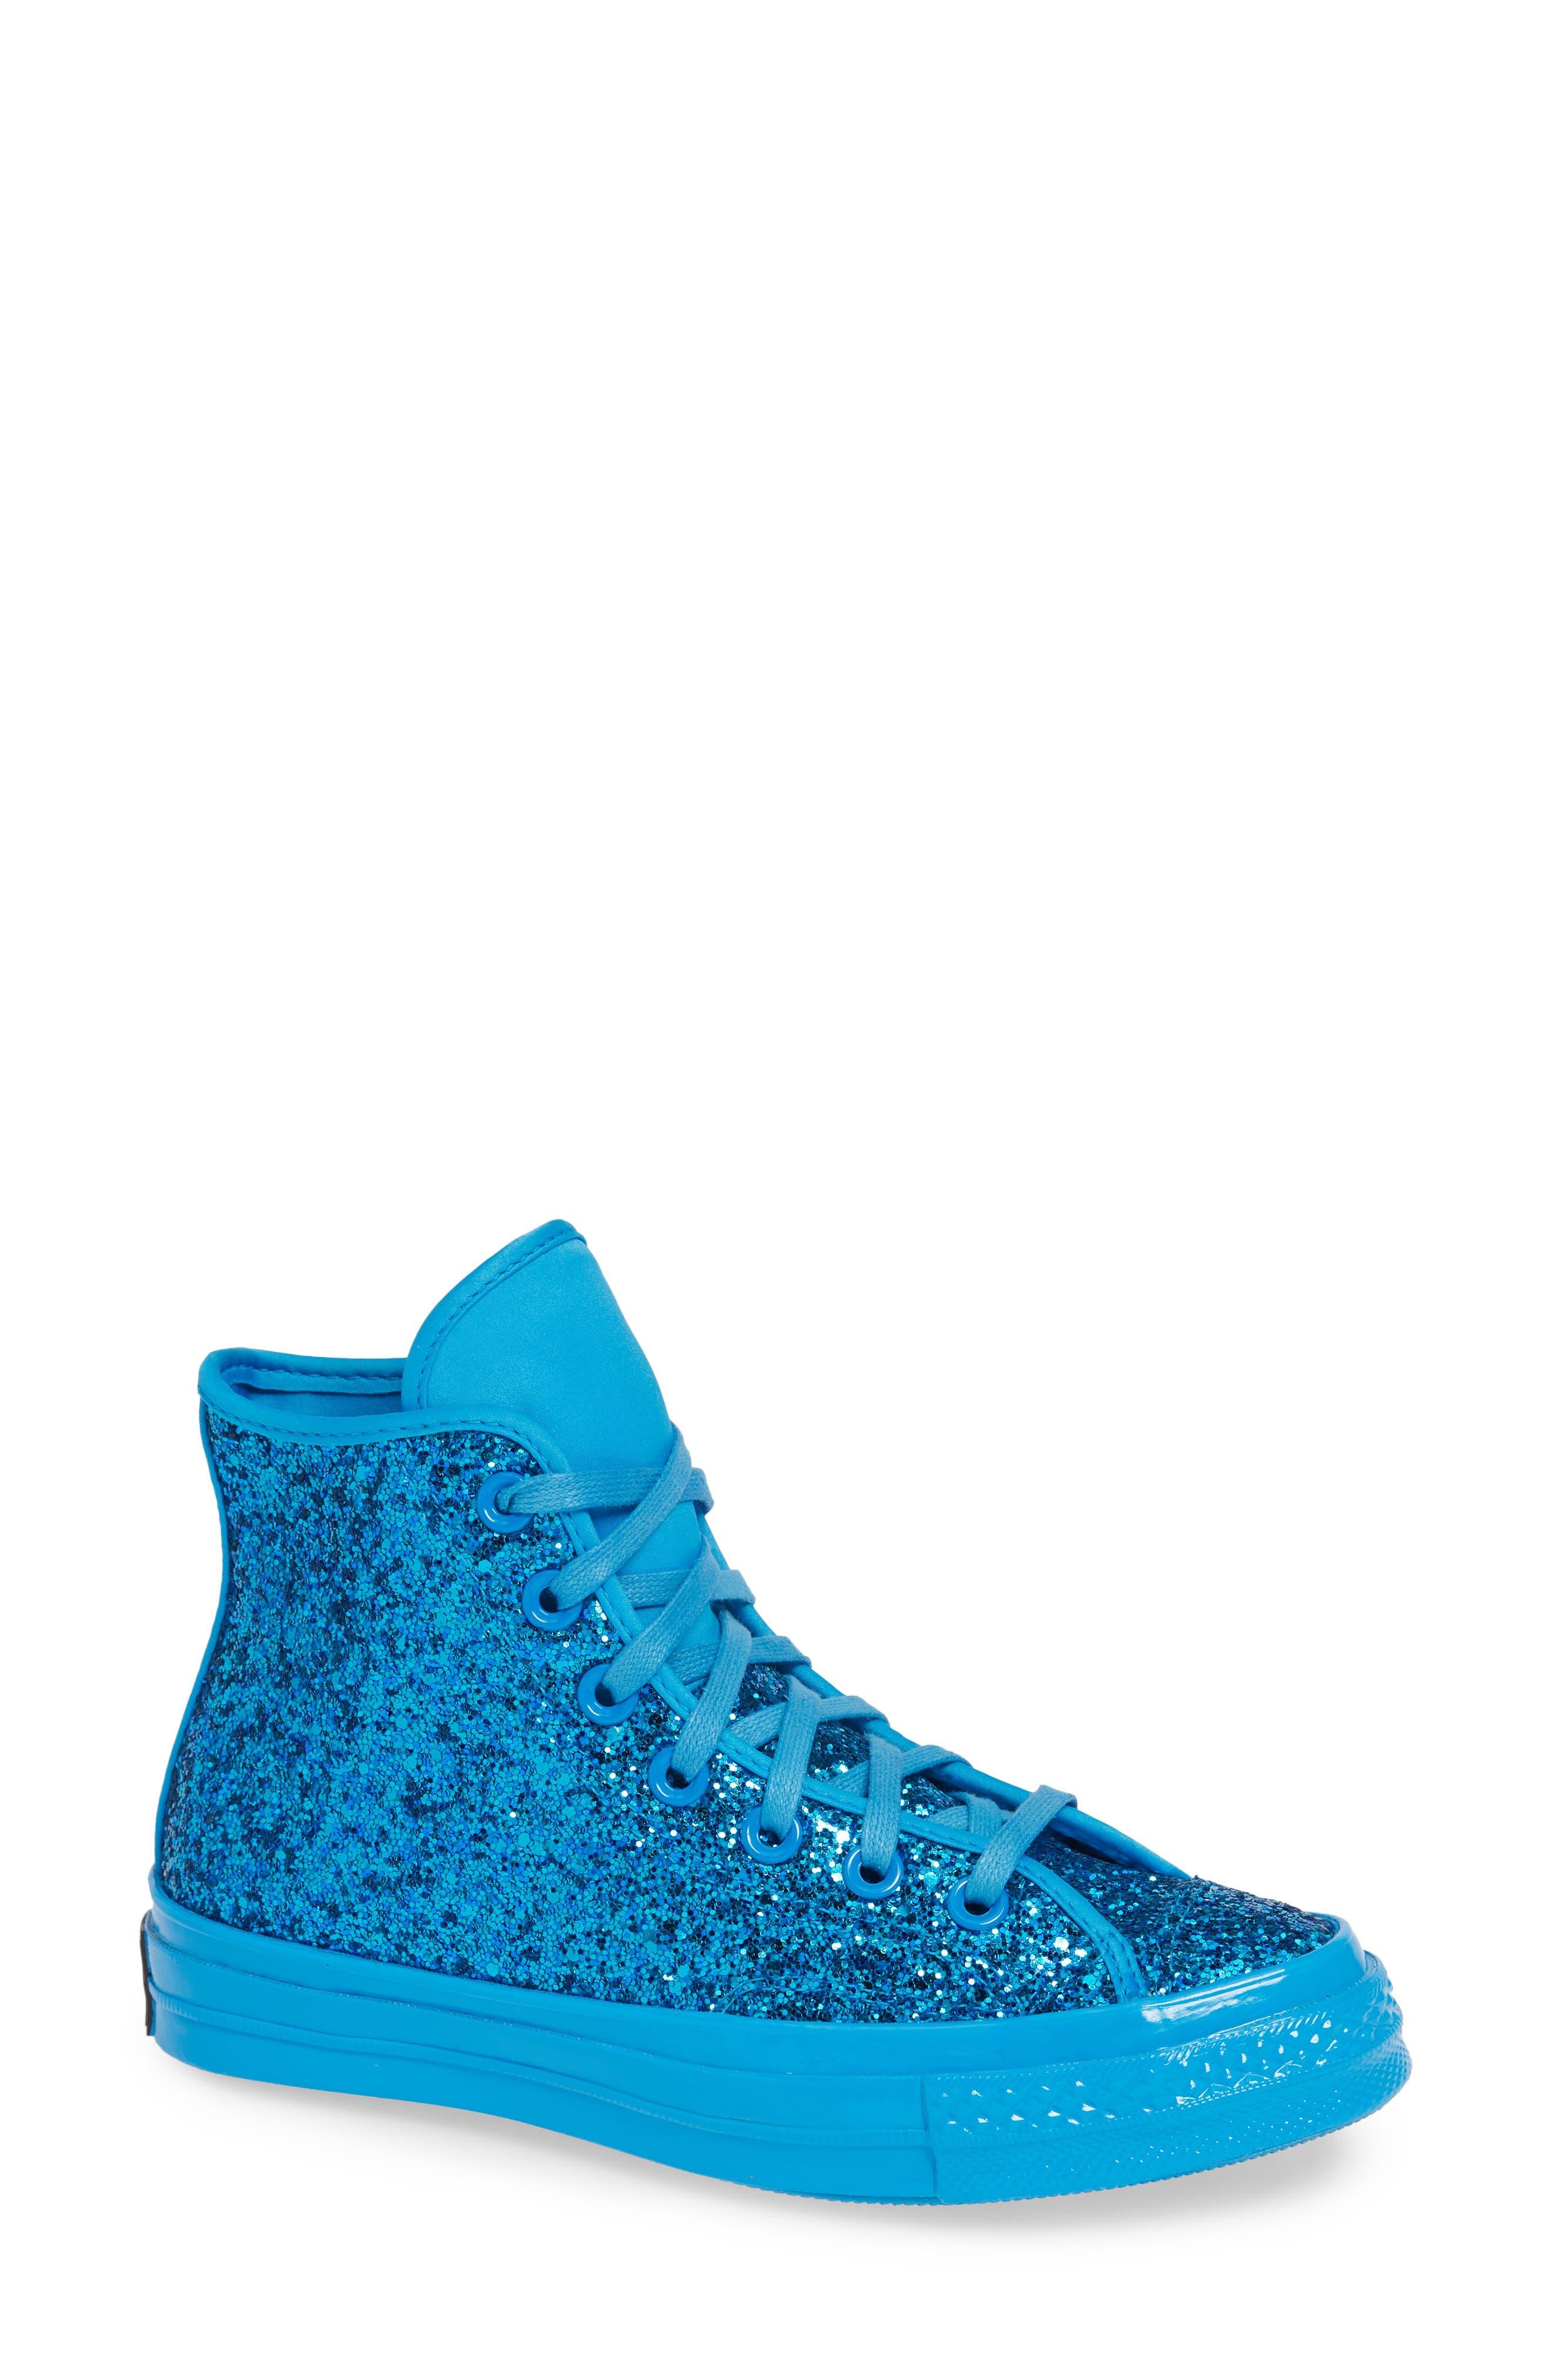 7fbae64d1 ... cheapest converse chuck taylor all star glitter high top sneaker women  81f5b 80794